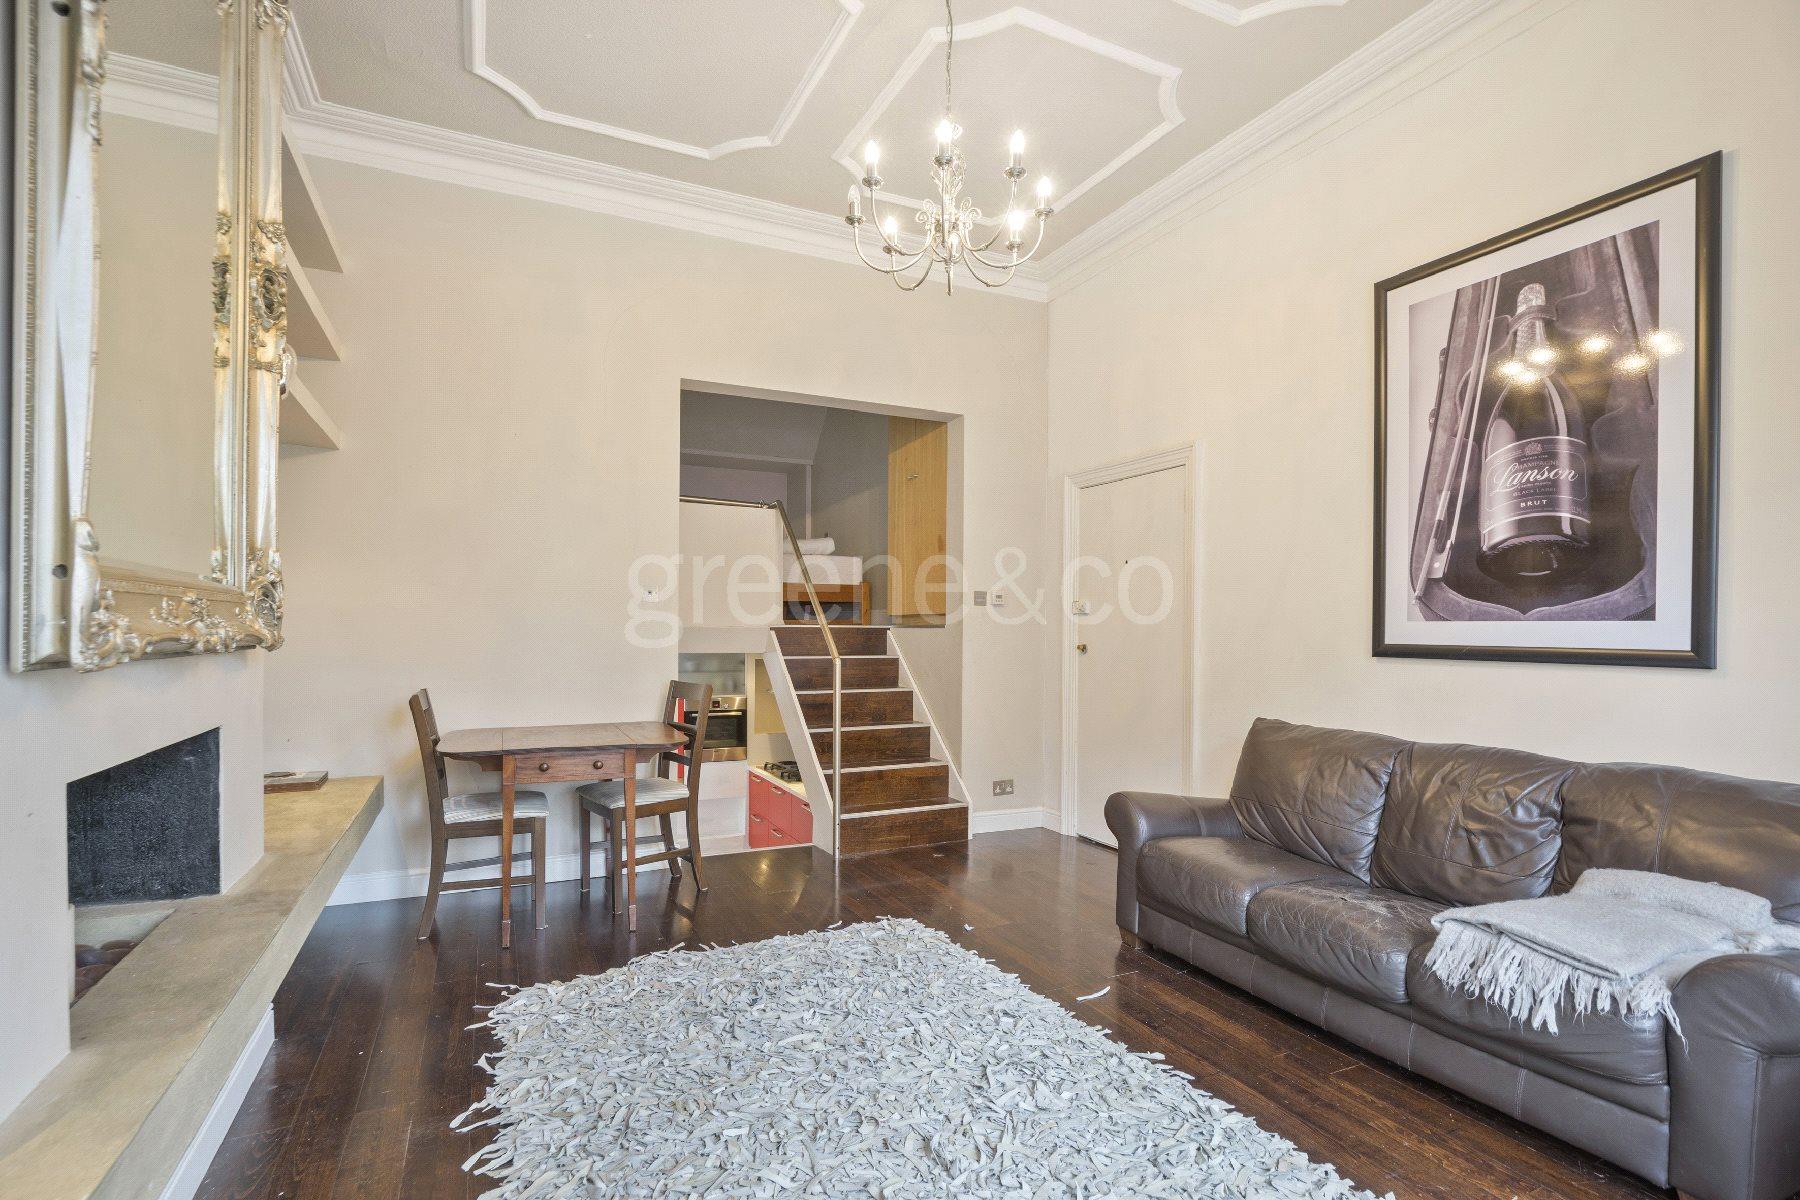 1 Bedroom Flat for sale in Gondar Gardens, West Hampstead, London, NW6